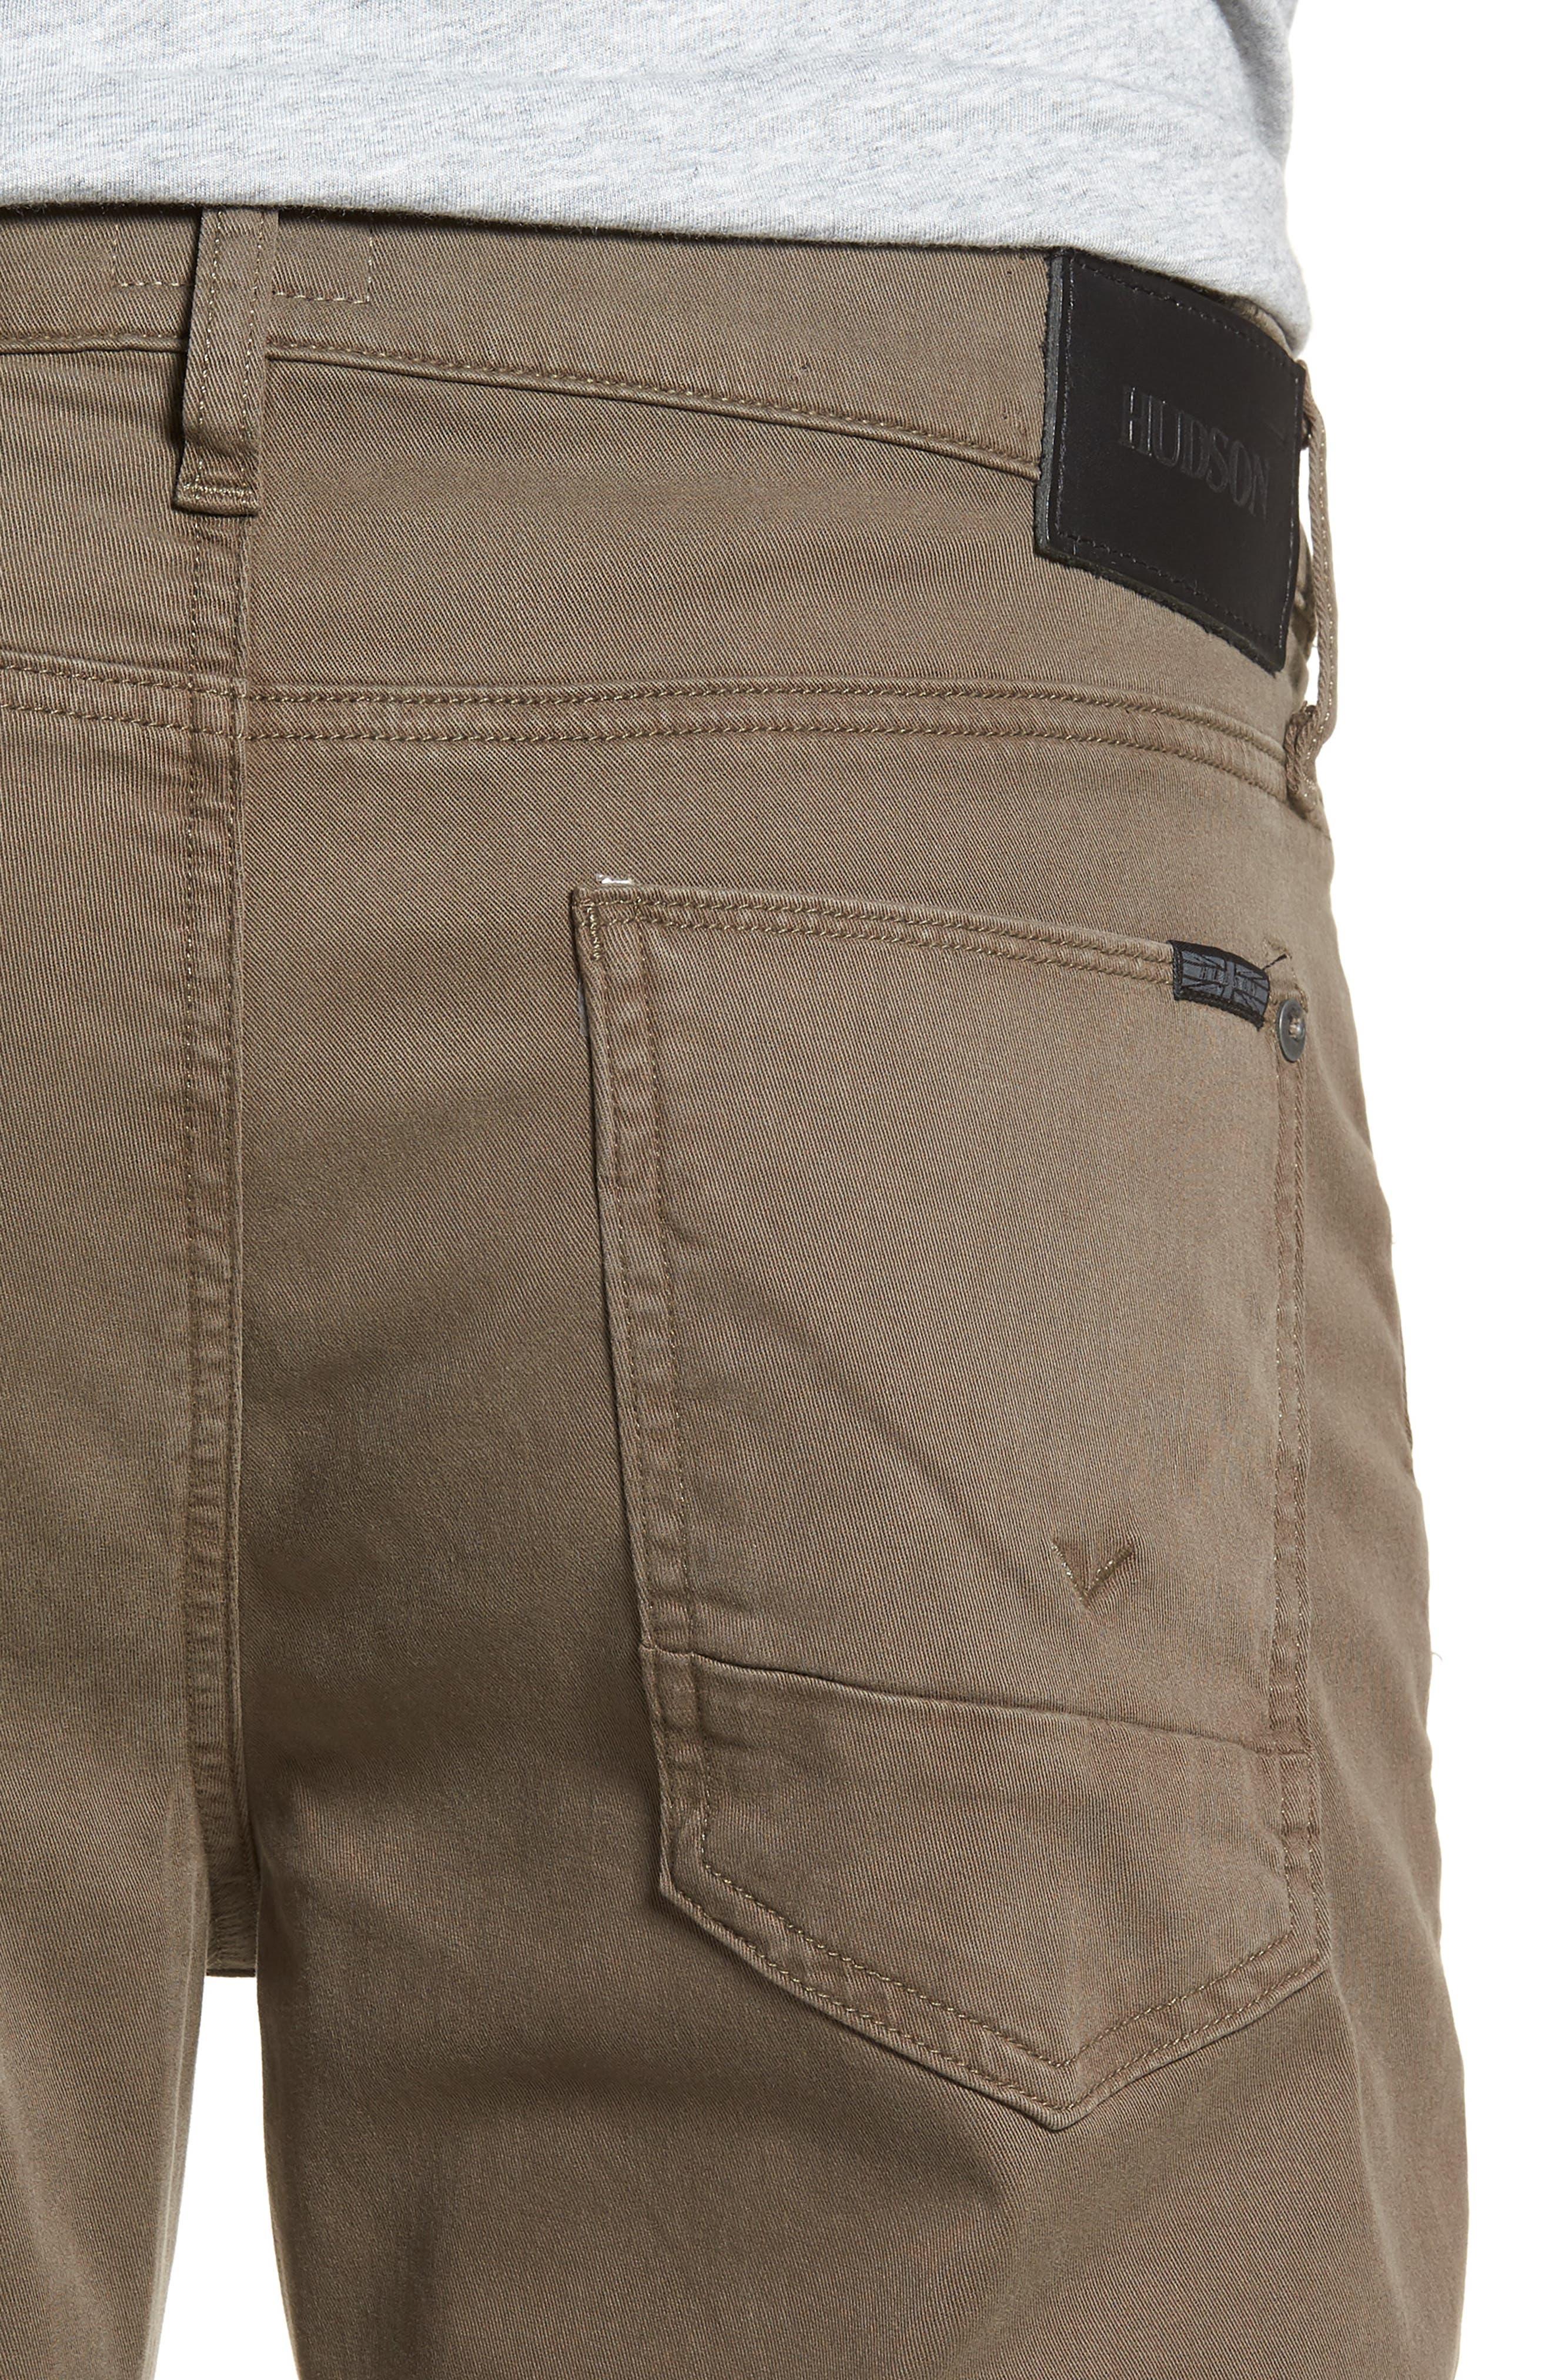 Blake Slim Fit Jeans,                             Alternate thumbnail 4, color,                             PLASTER